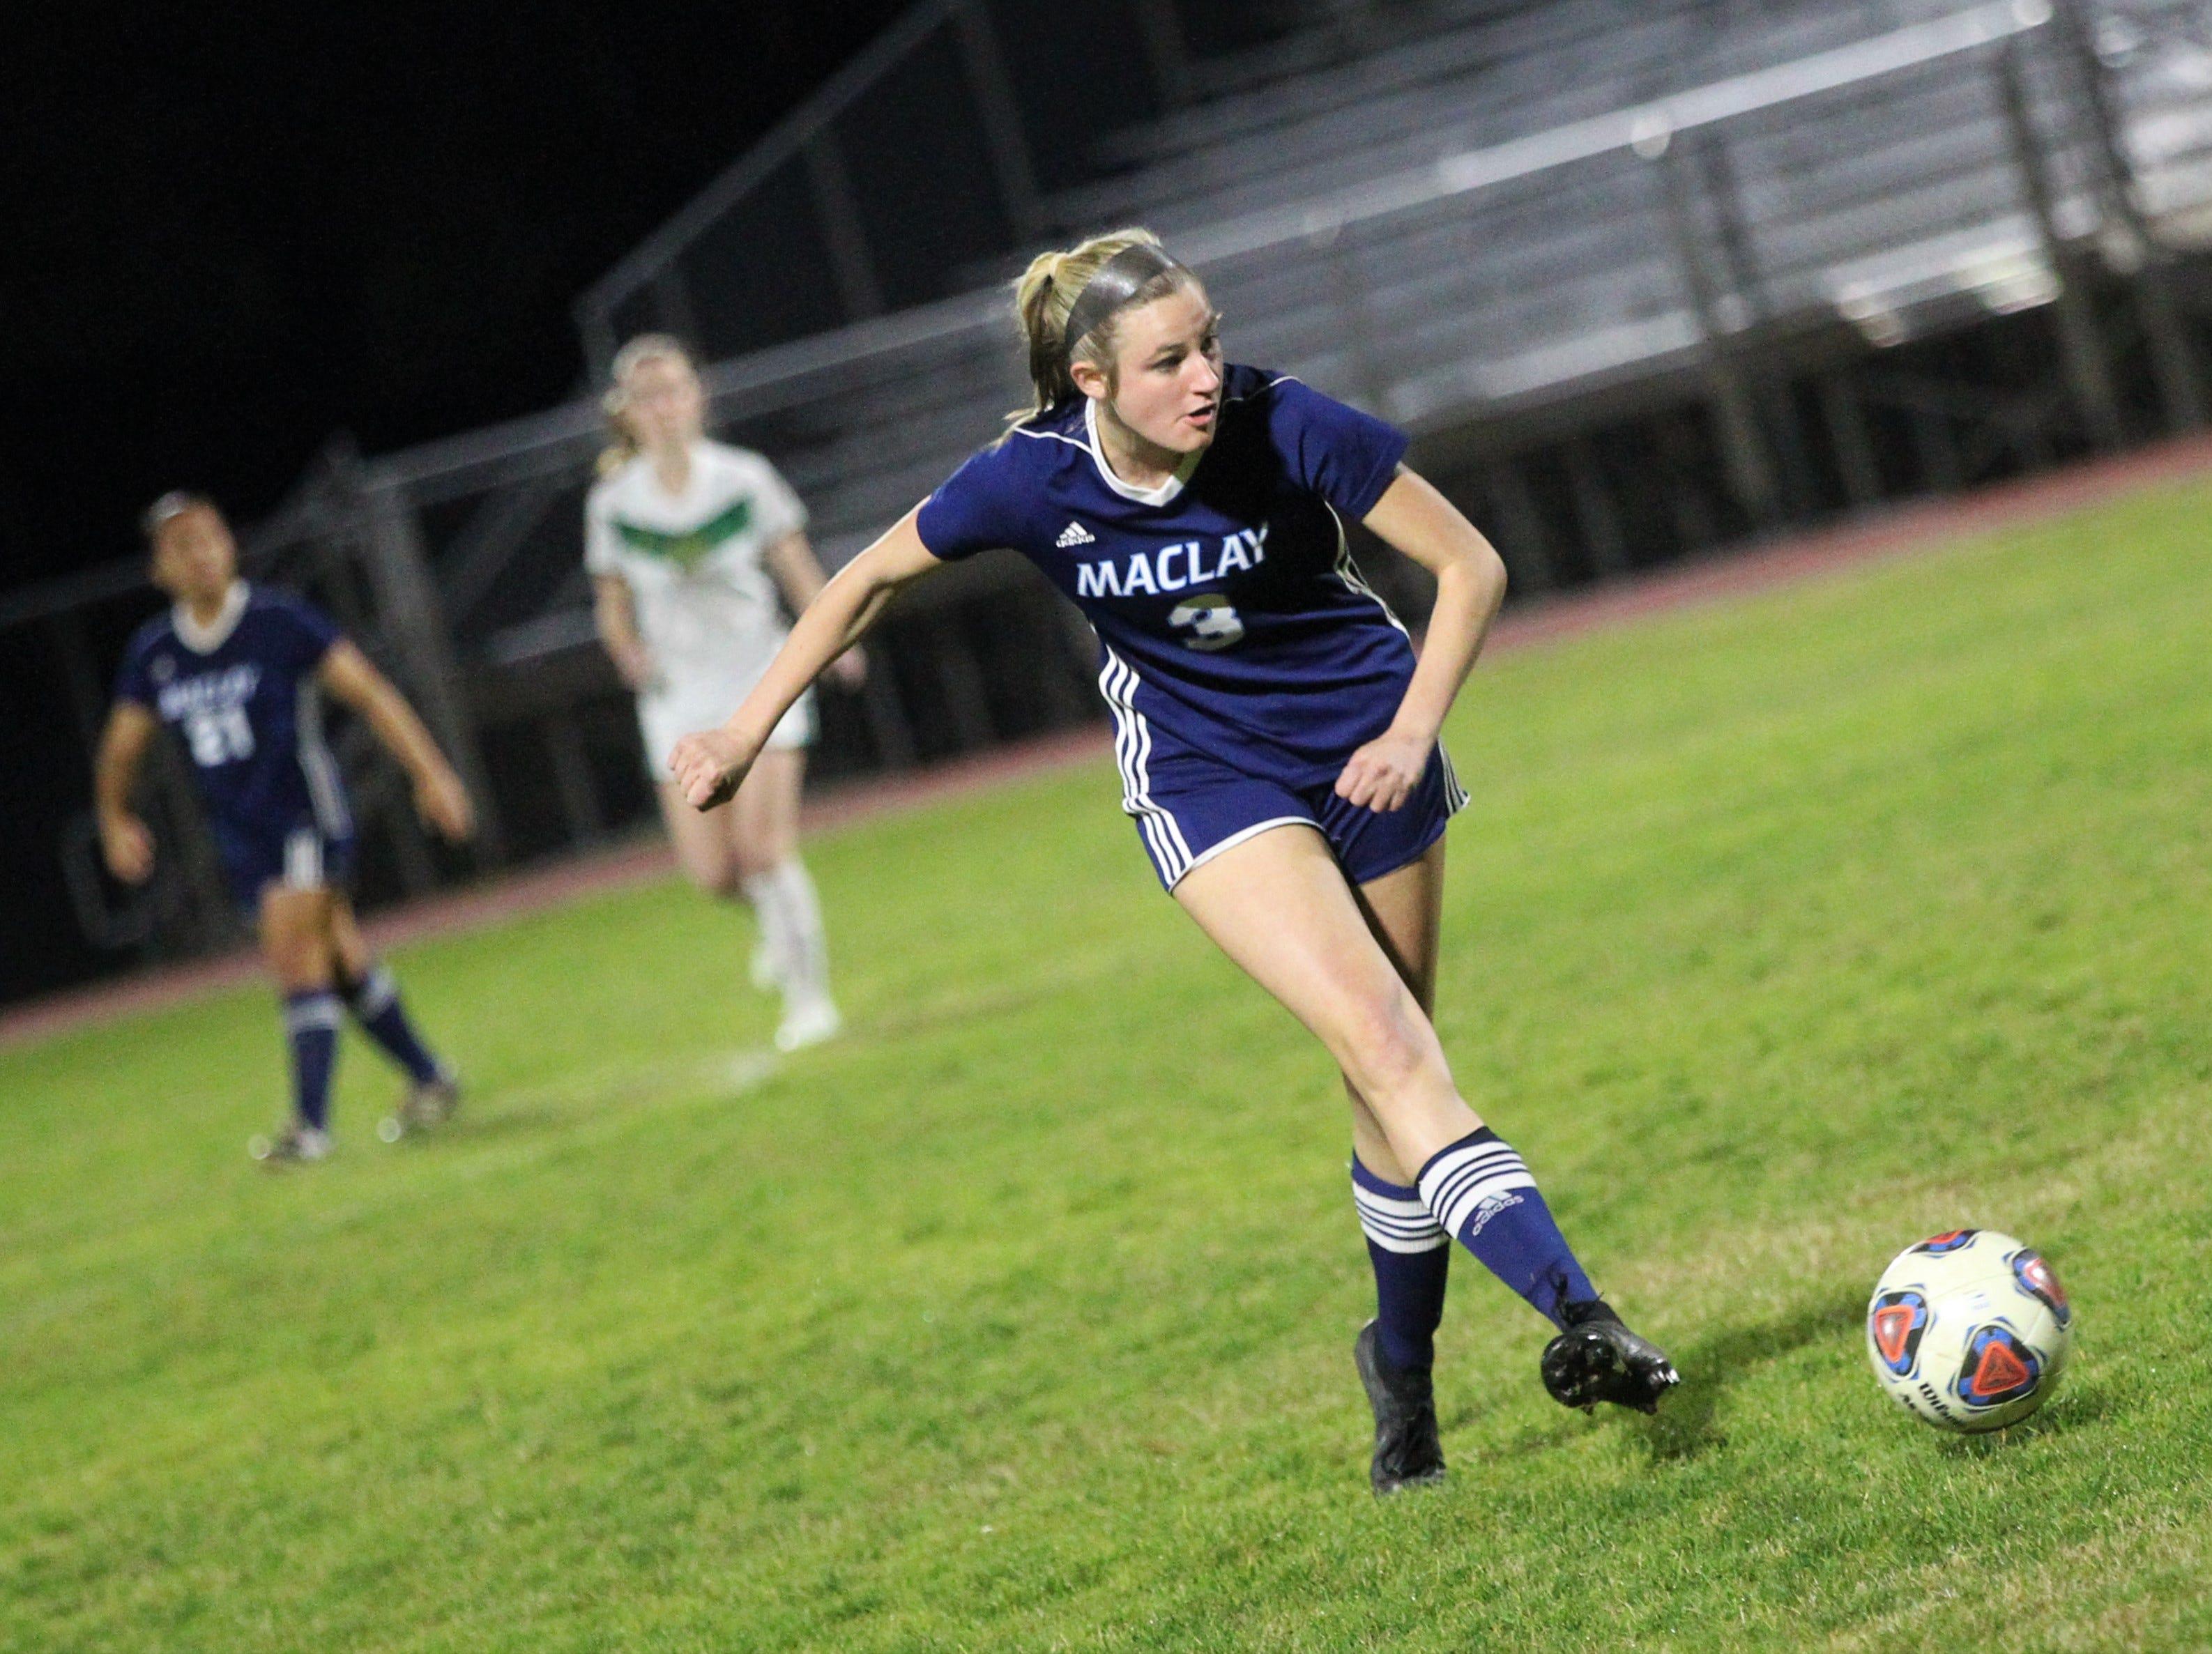 Maclay's Kate Smith plays a pass upfield as Maclay's girls soccer team beat St. Joseph Academy 4-0 in a Region 1-1A quarterfinal on Jan. 5, 2019.